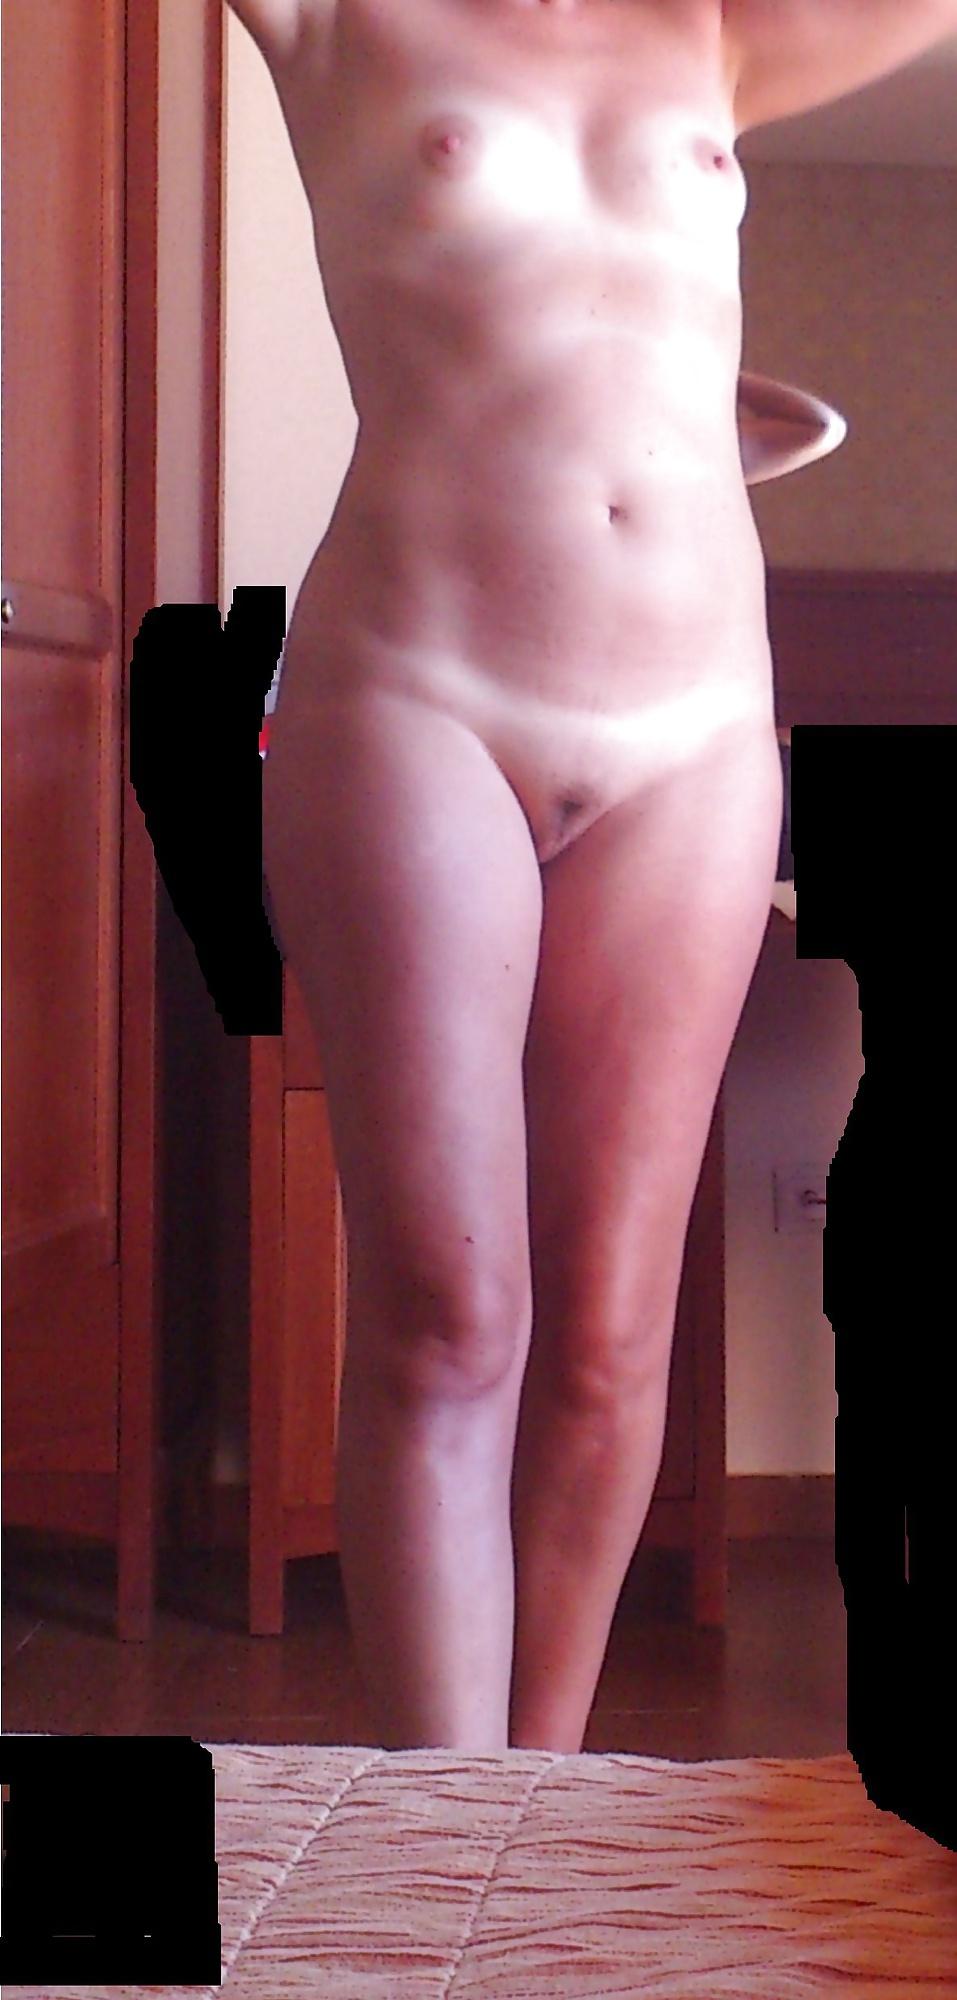 Teen hottie bristol london makes her sweet pussy cum - 2 part 7